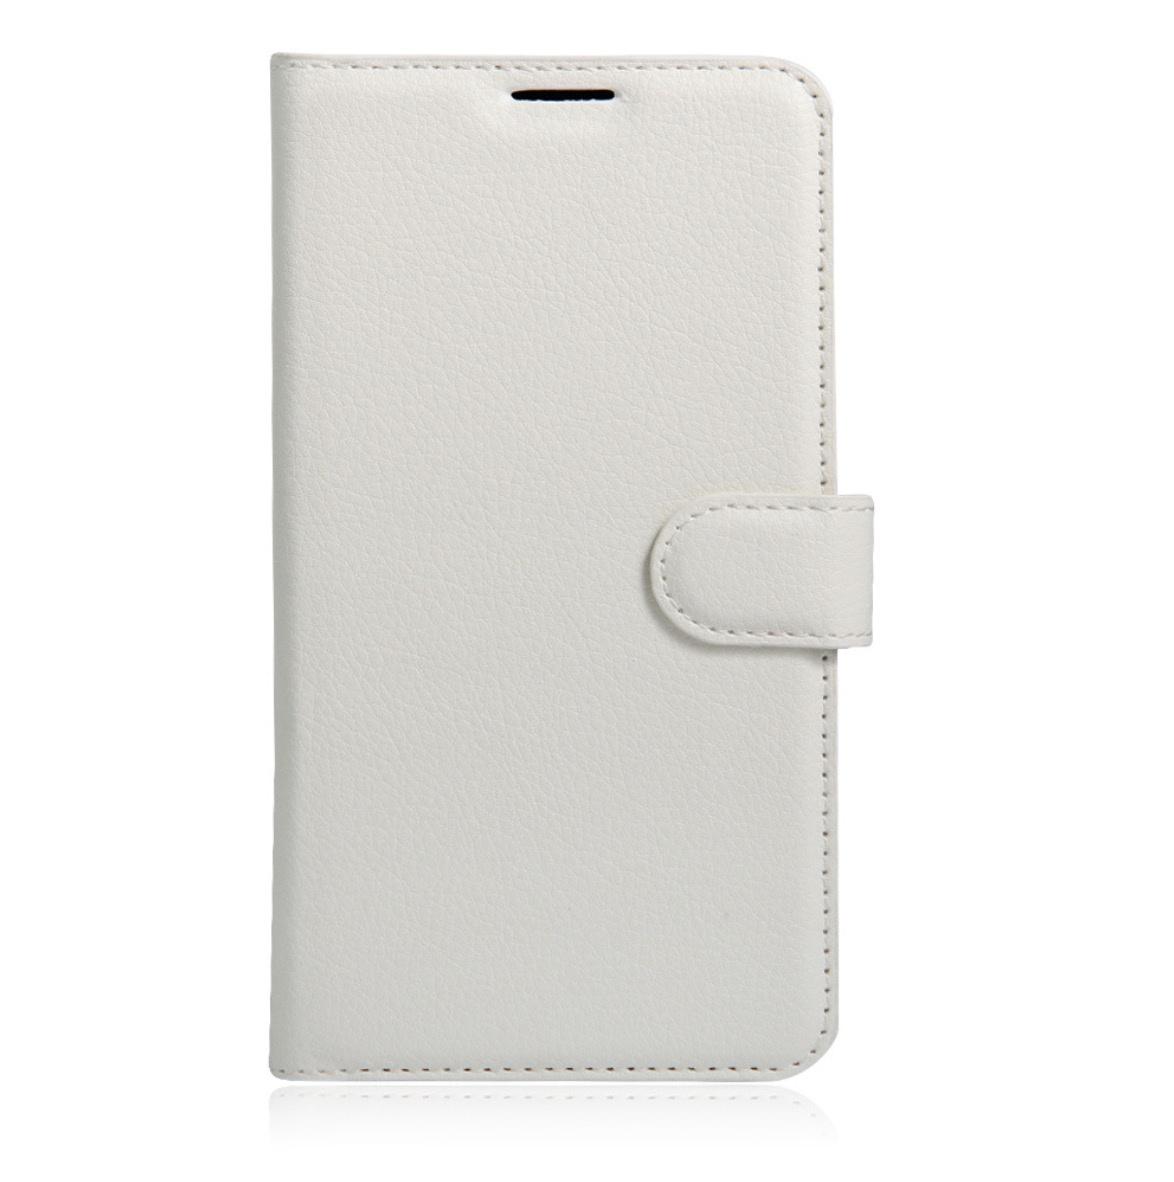 "Чехол-книжка MyPads для Sony Xperia XA / XA Dual 5.0"" (F3113/ F3112 / F3115 /E6533) с мульти-подставкой застёжкой и визитницей белый"